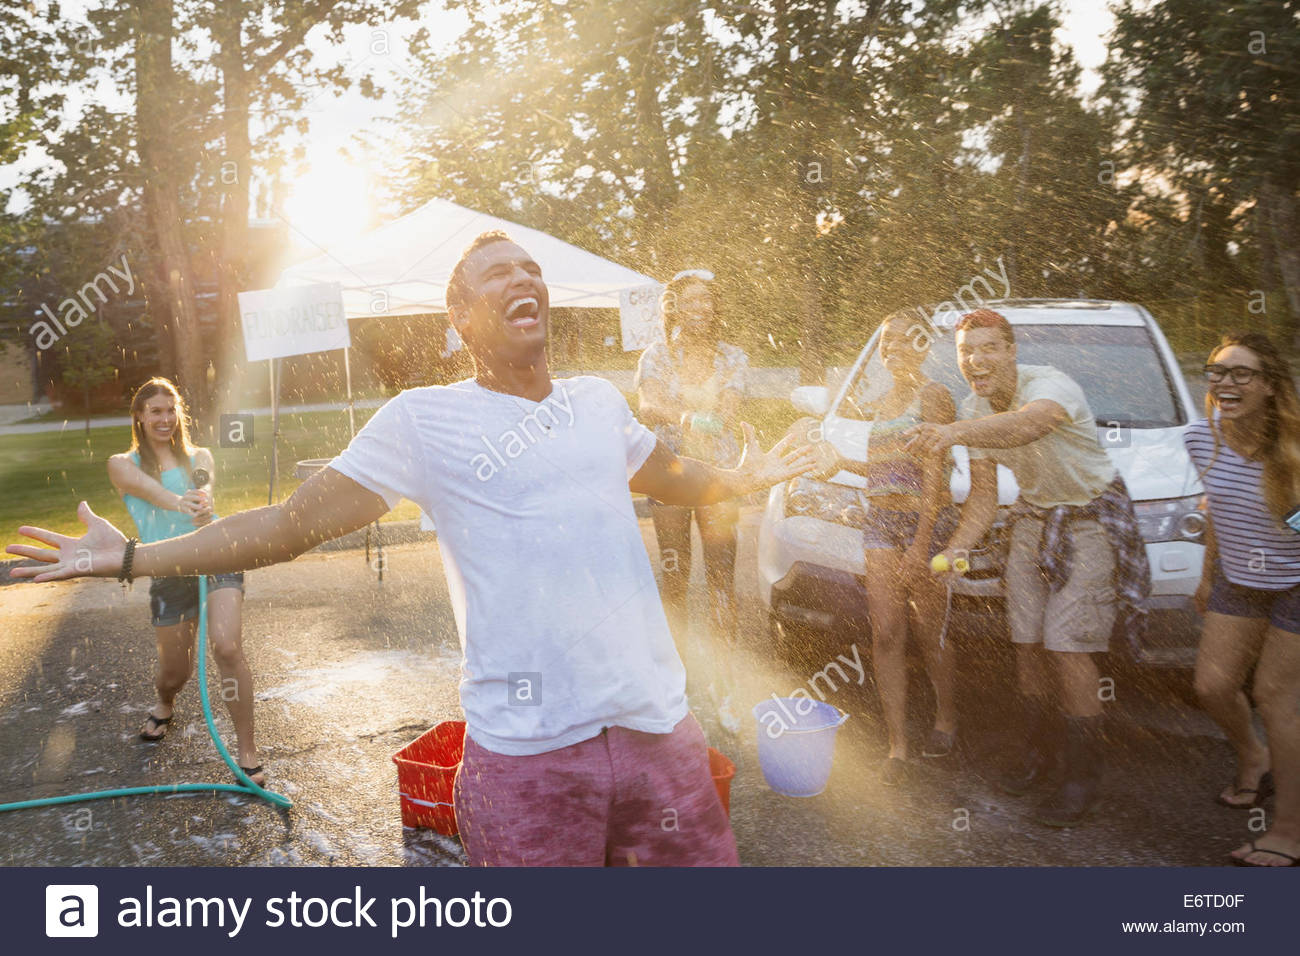 Woman spraying man with hose at car wash - Stock Image